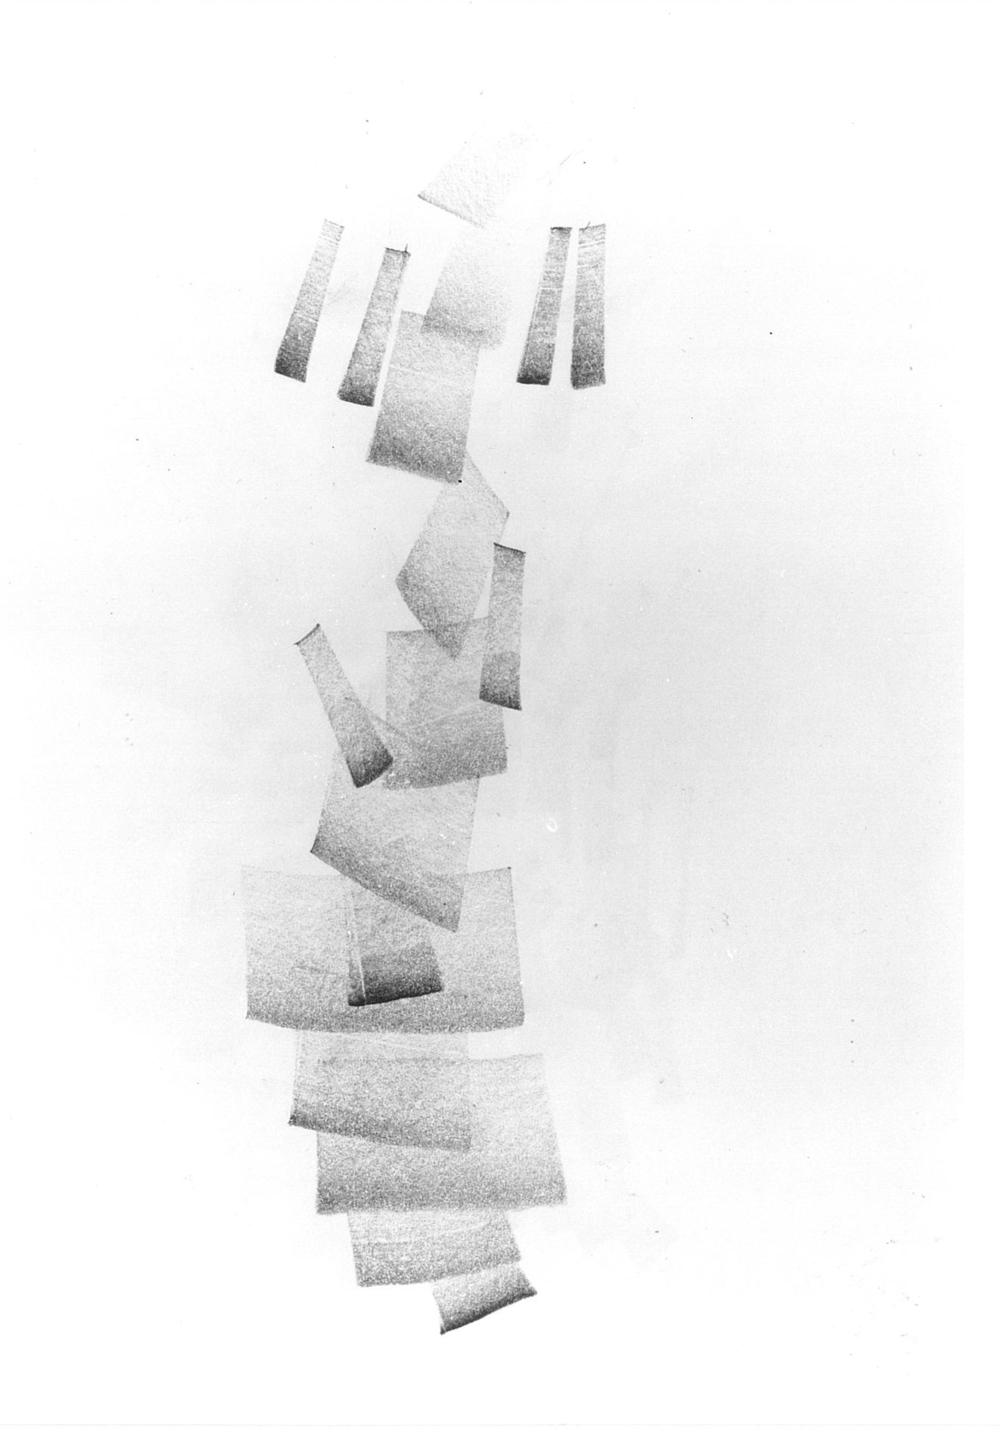 disegno 2 , cm 20x30